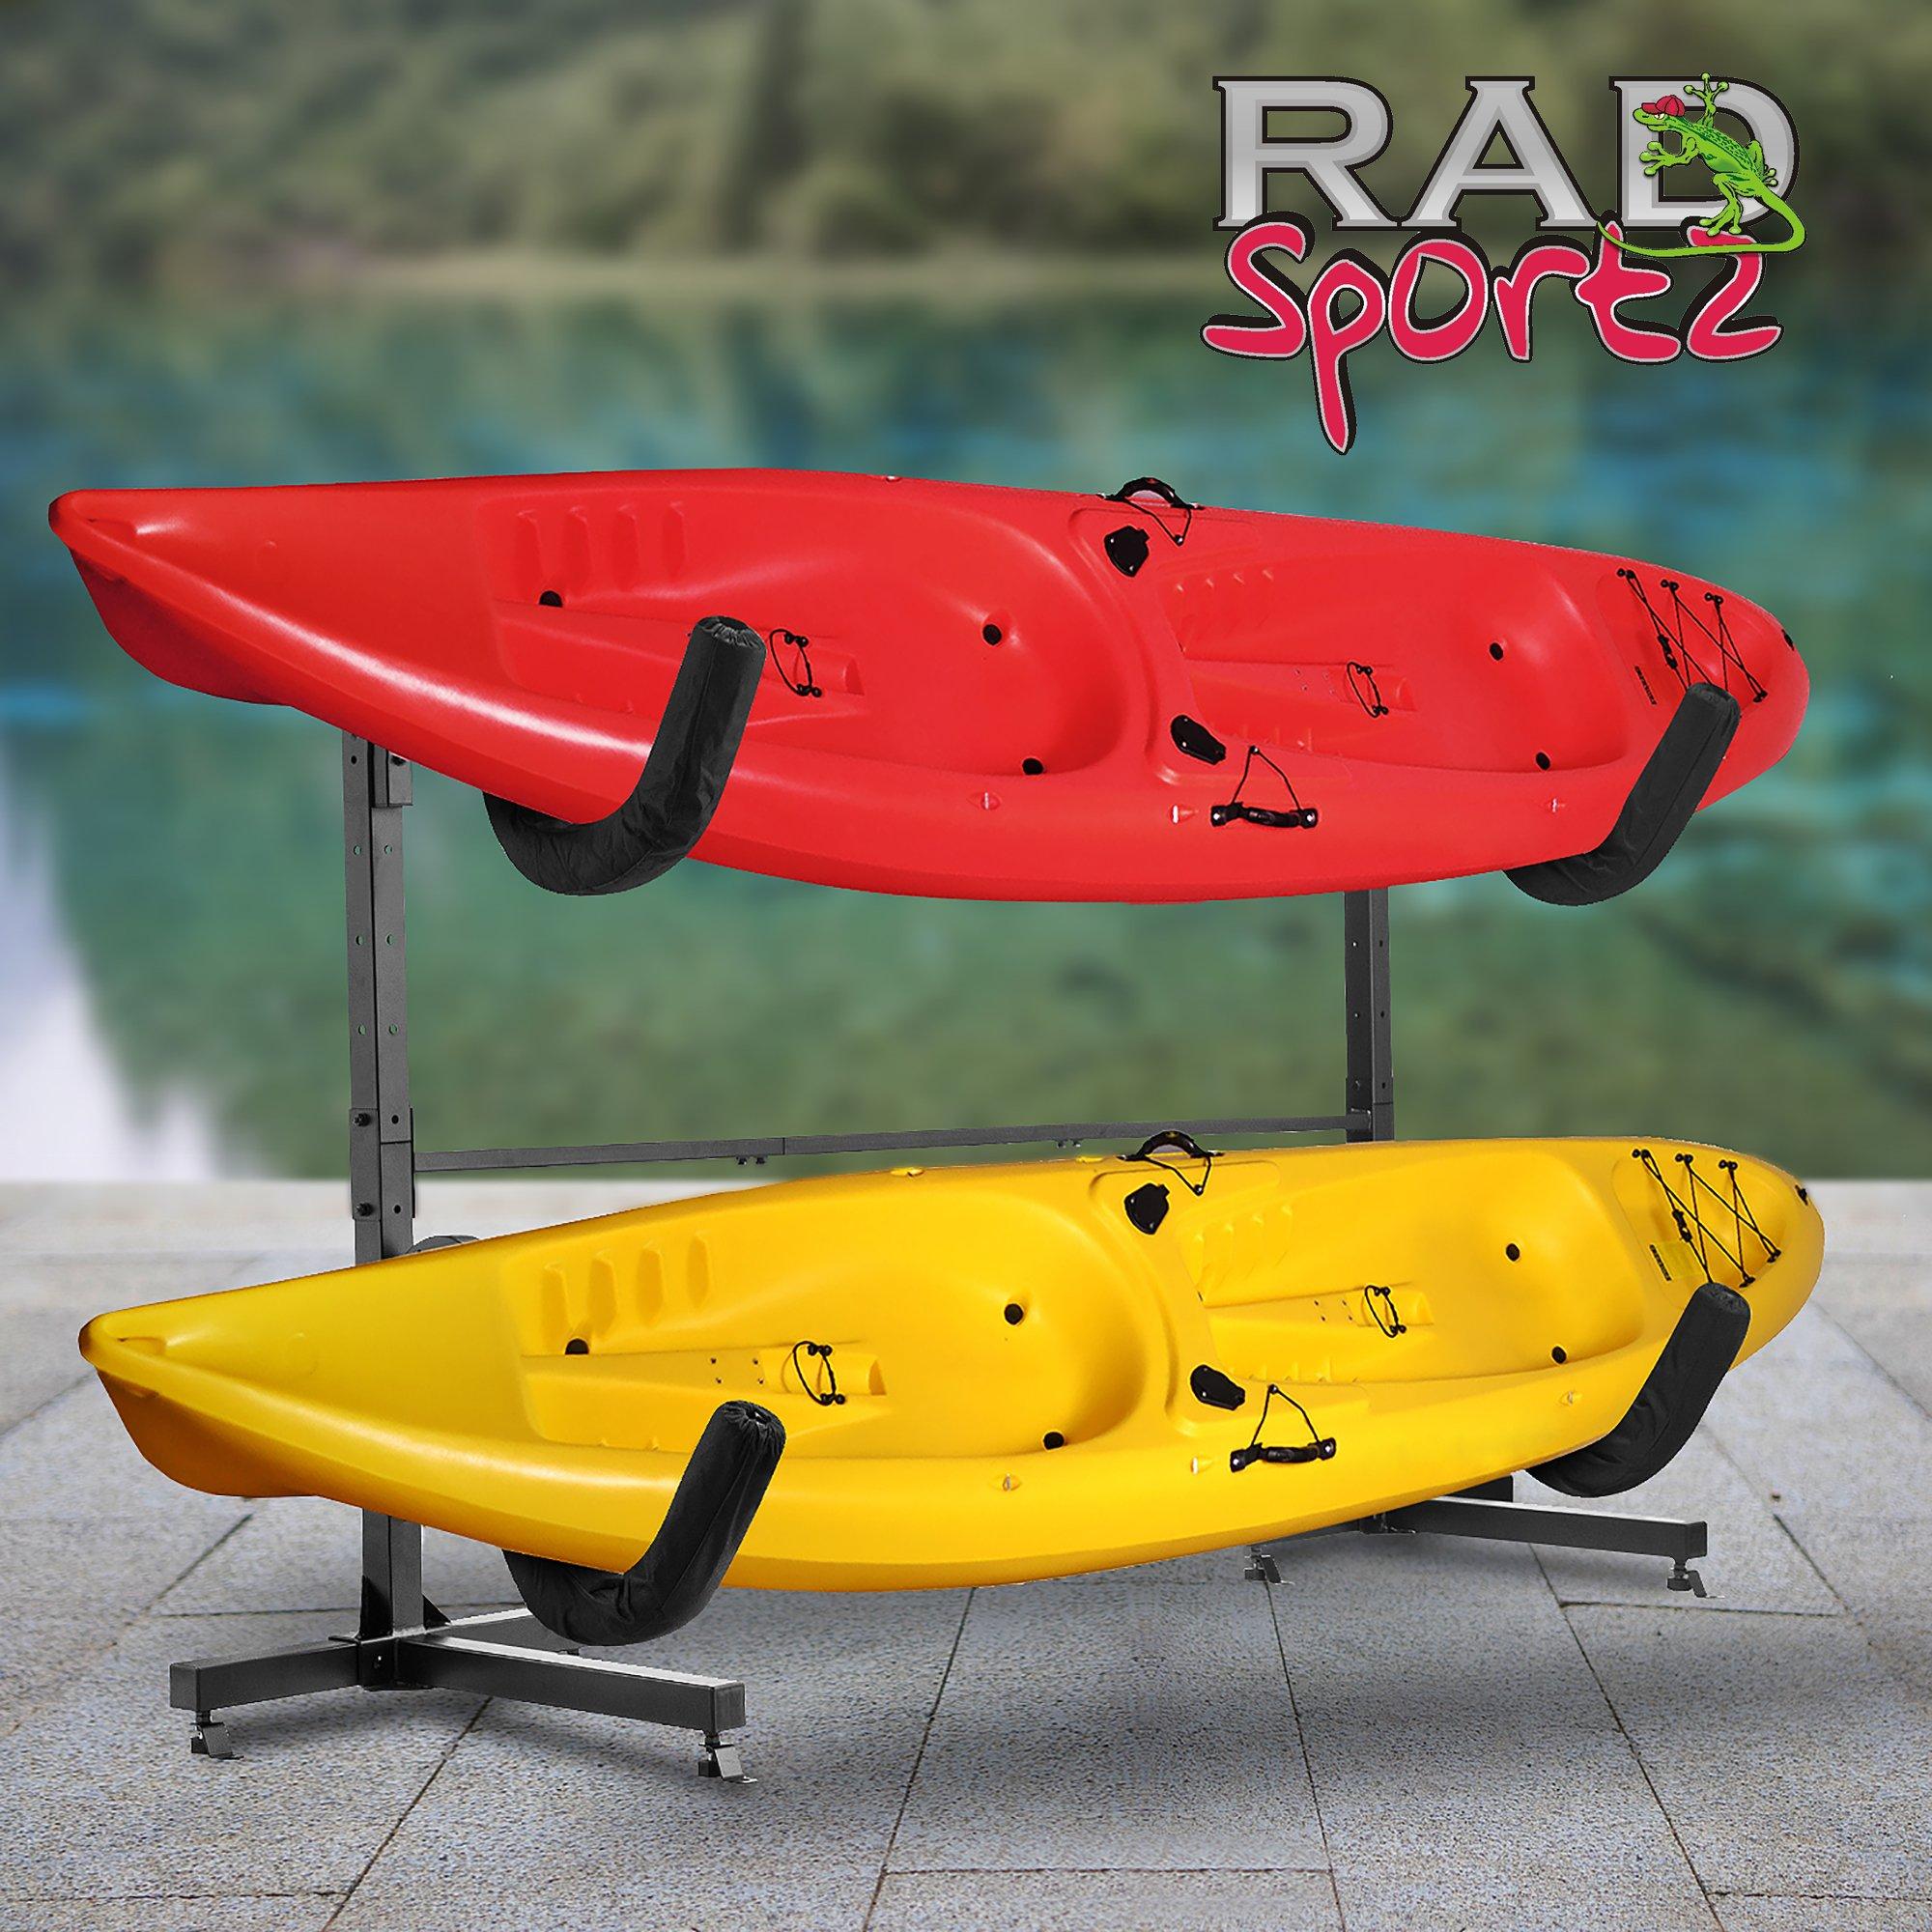 Best Rated In Indoor Kayak Storage Helpful Customer Reviews Battery Wiring Diagram Rad Sportz Outdoor Freestanding Heavy Duty Two Or Paddle Board Rack